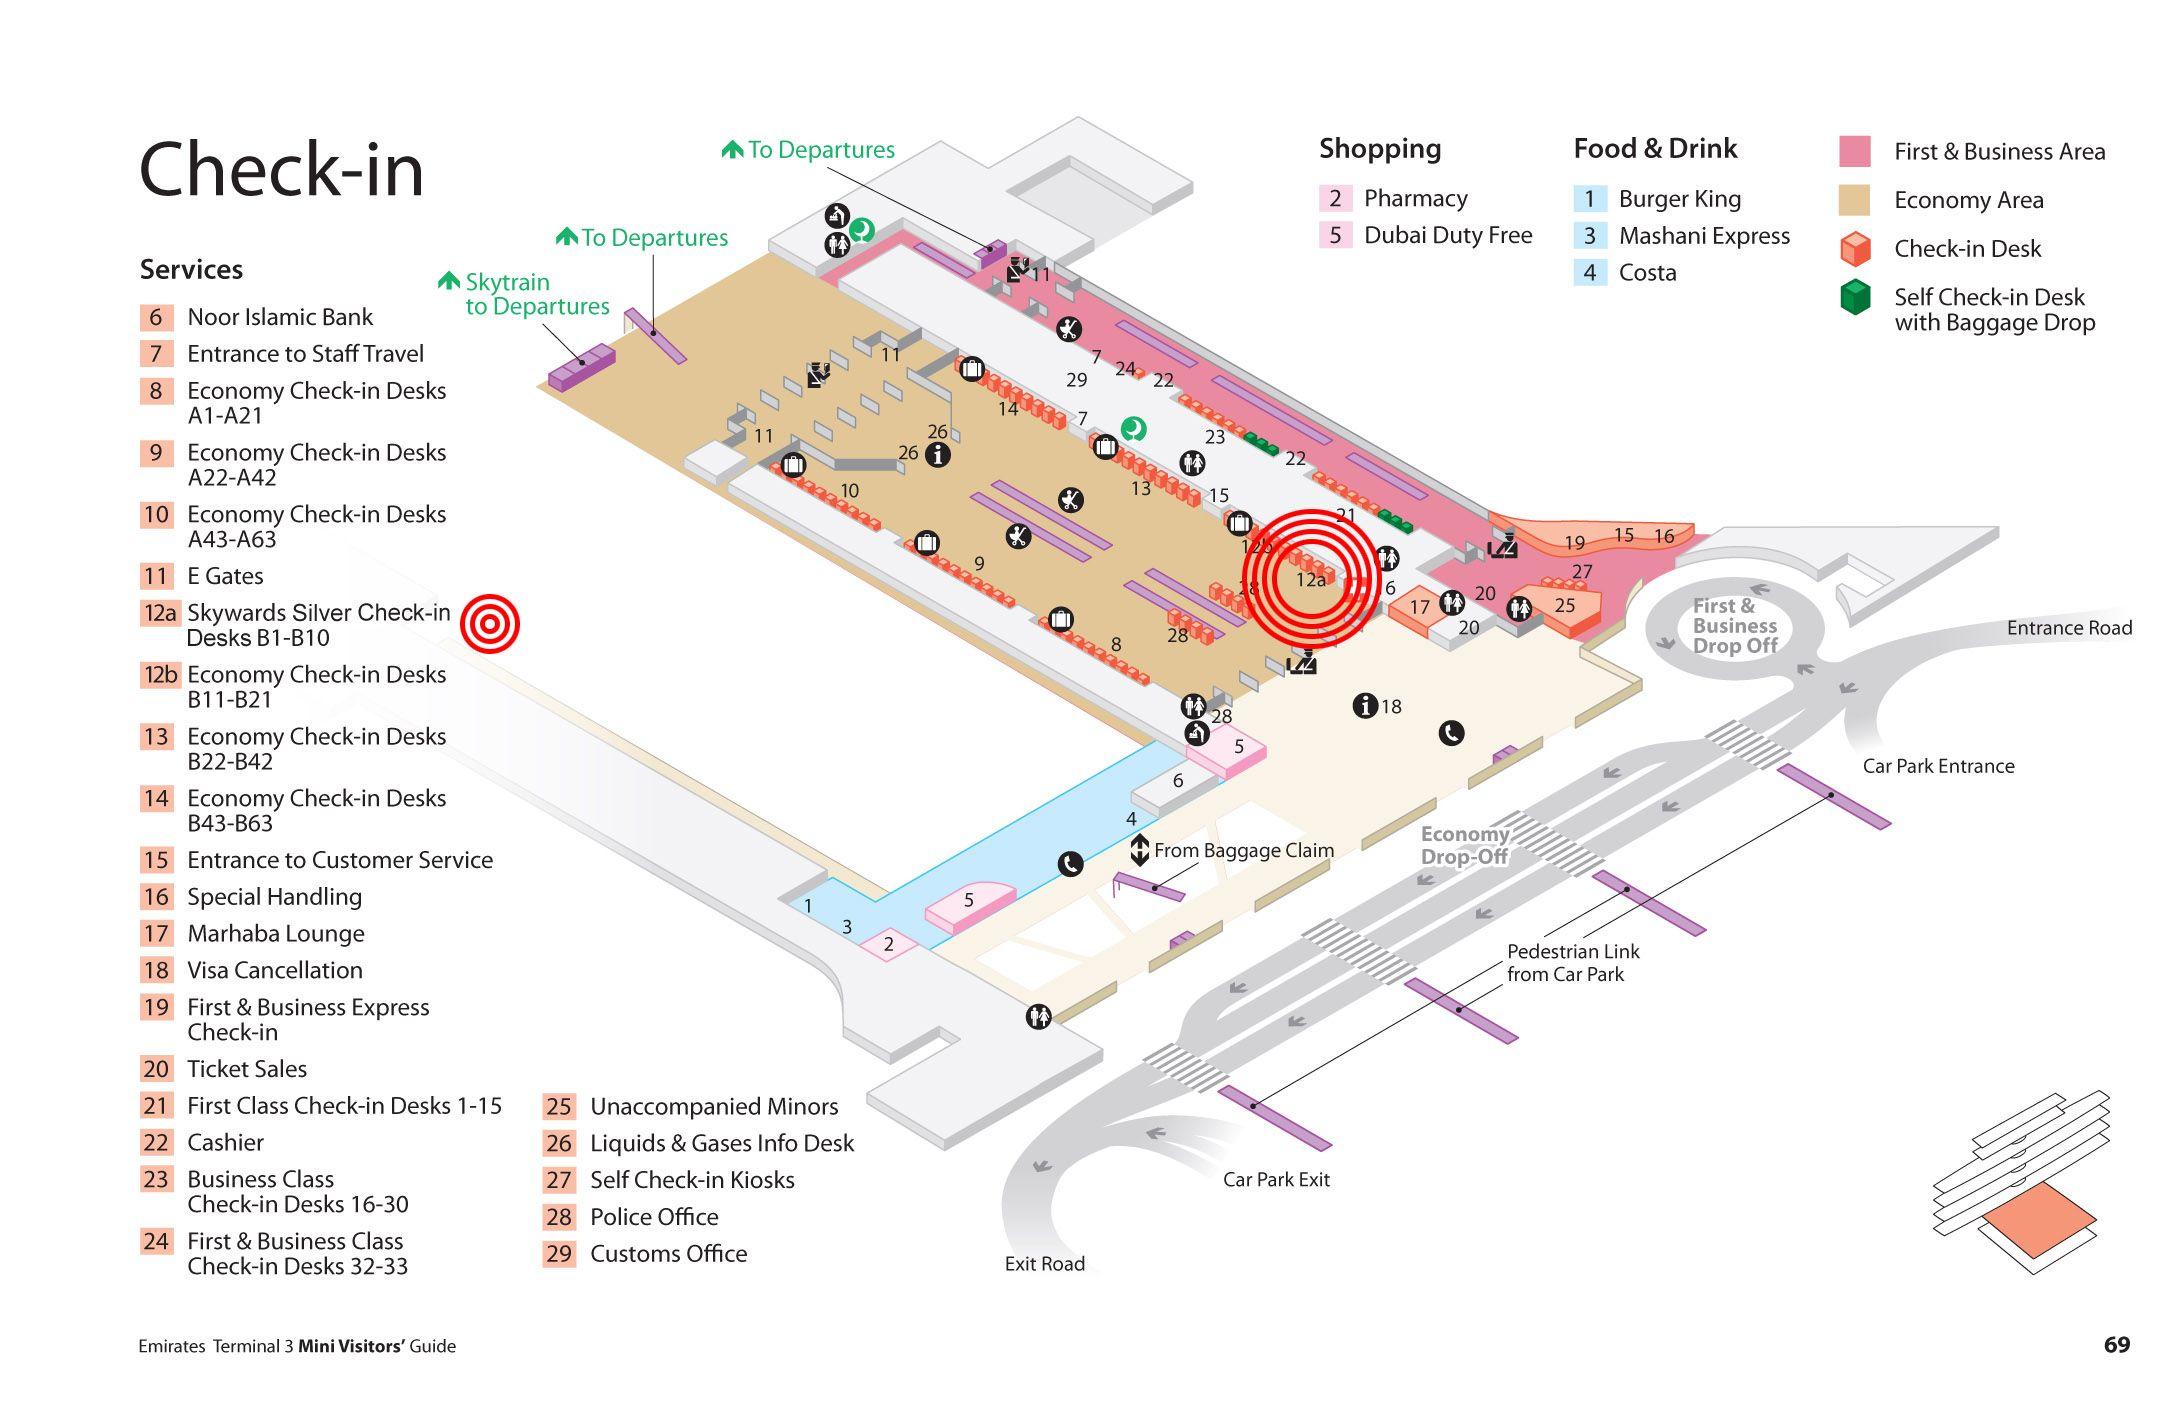 Emirates Terminal 3 Baggage Claim dubai airport map Pinterest